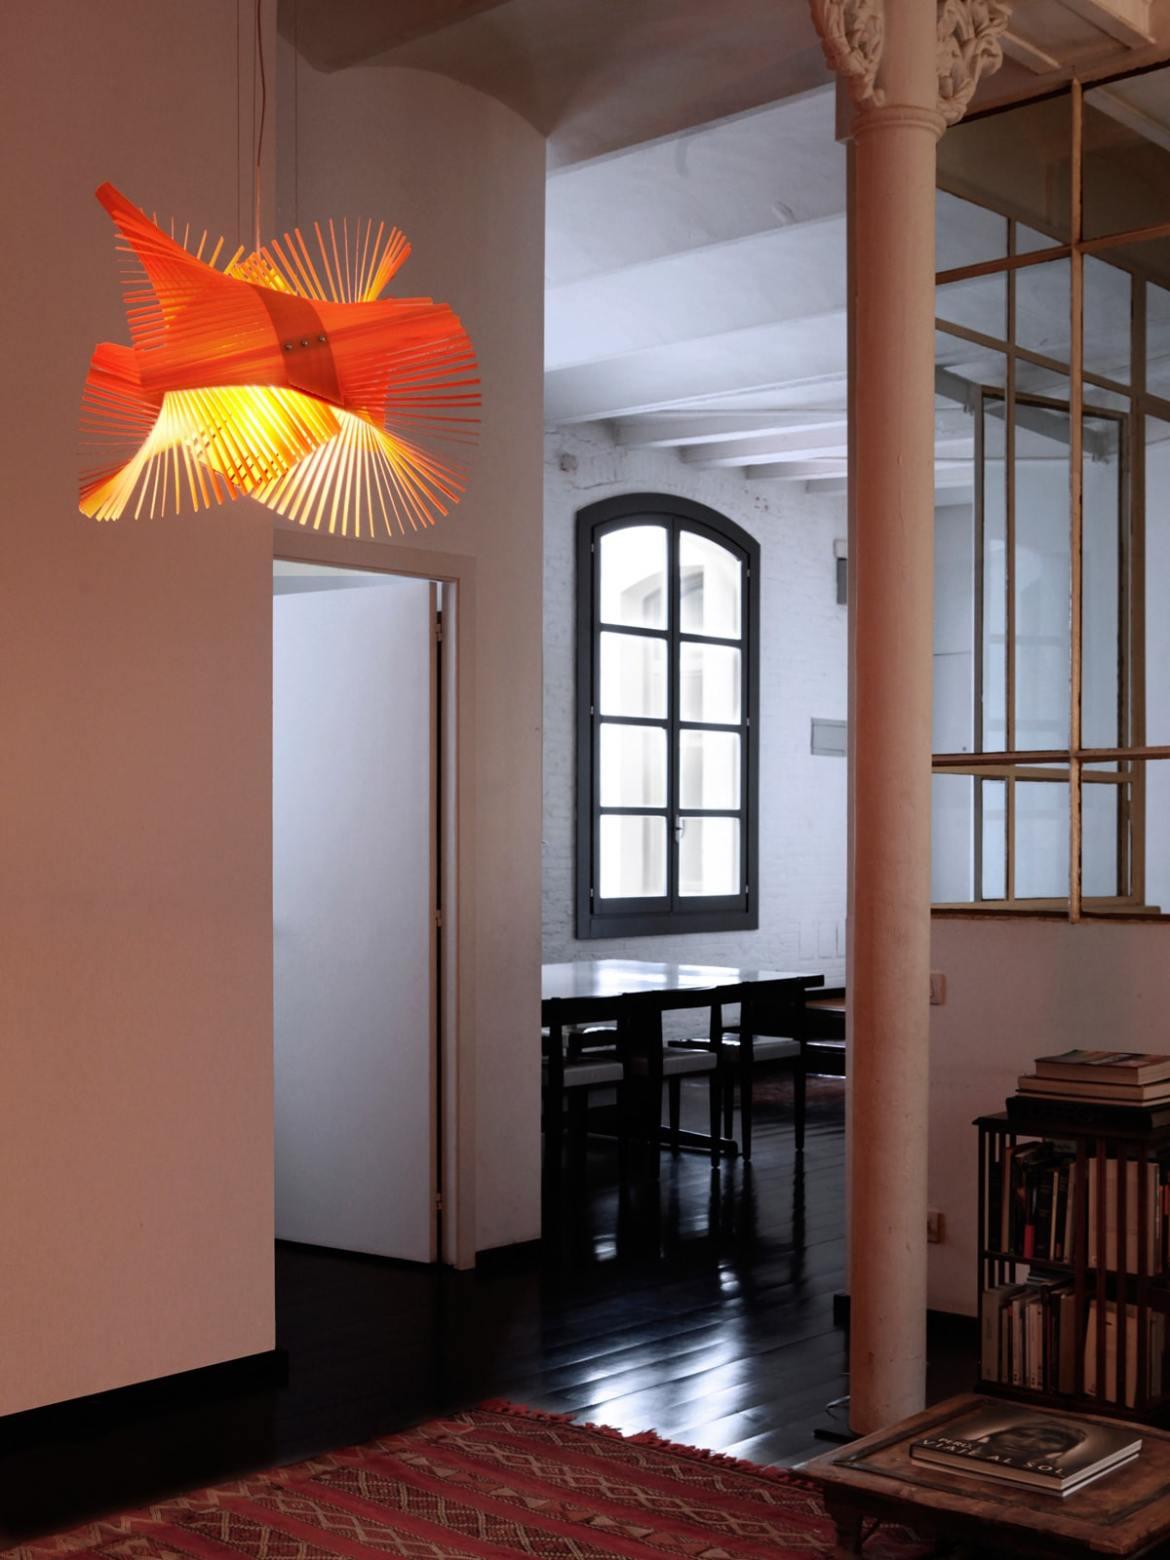 DesignOrt Blog: Faszination Farbe: Holzfurnier von LZF Lamps Minimikado